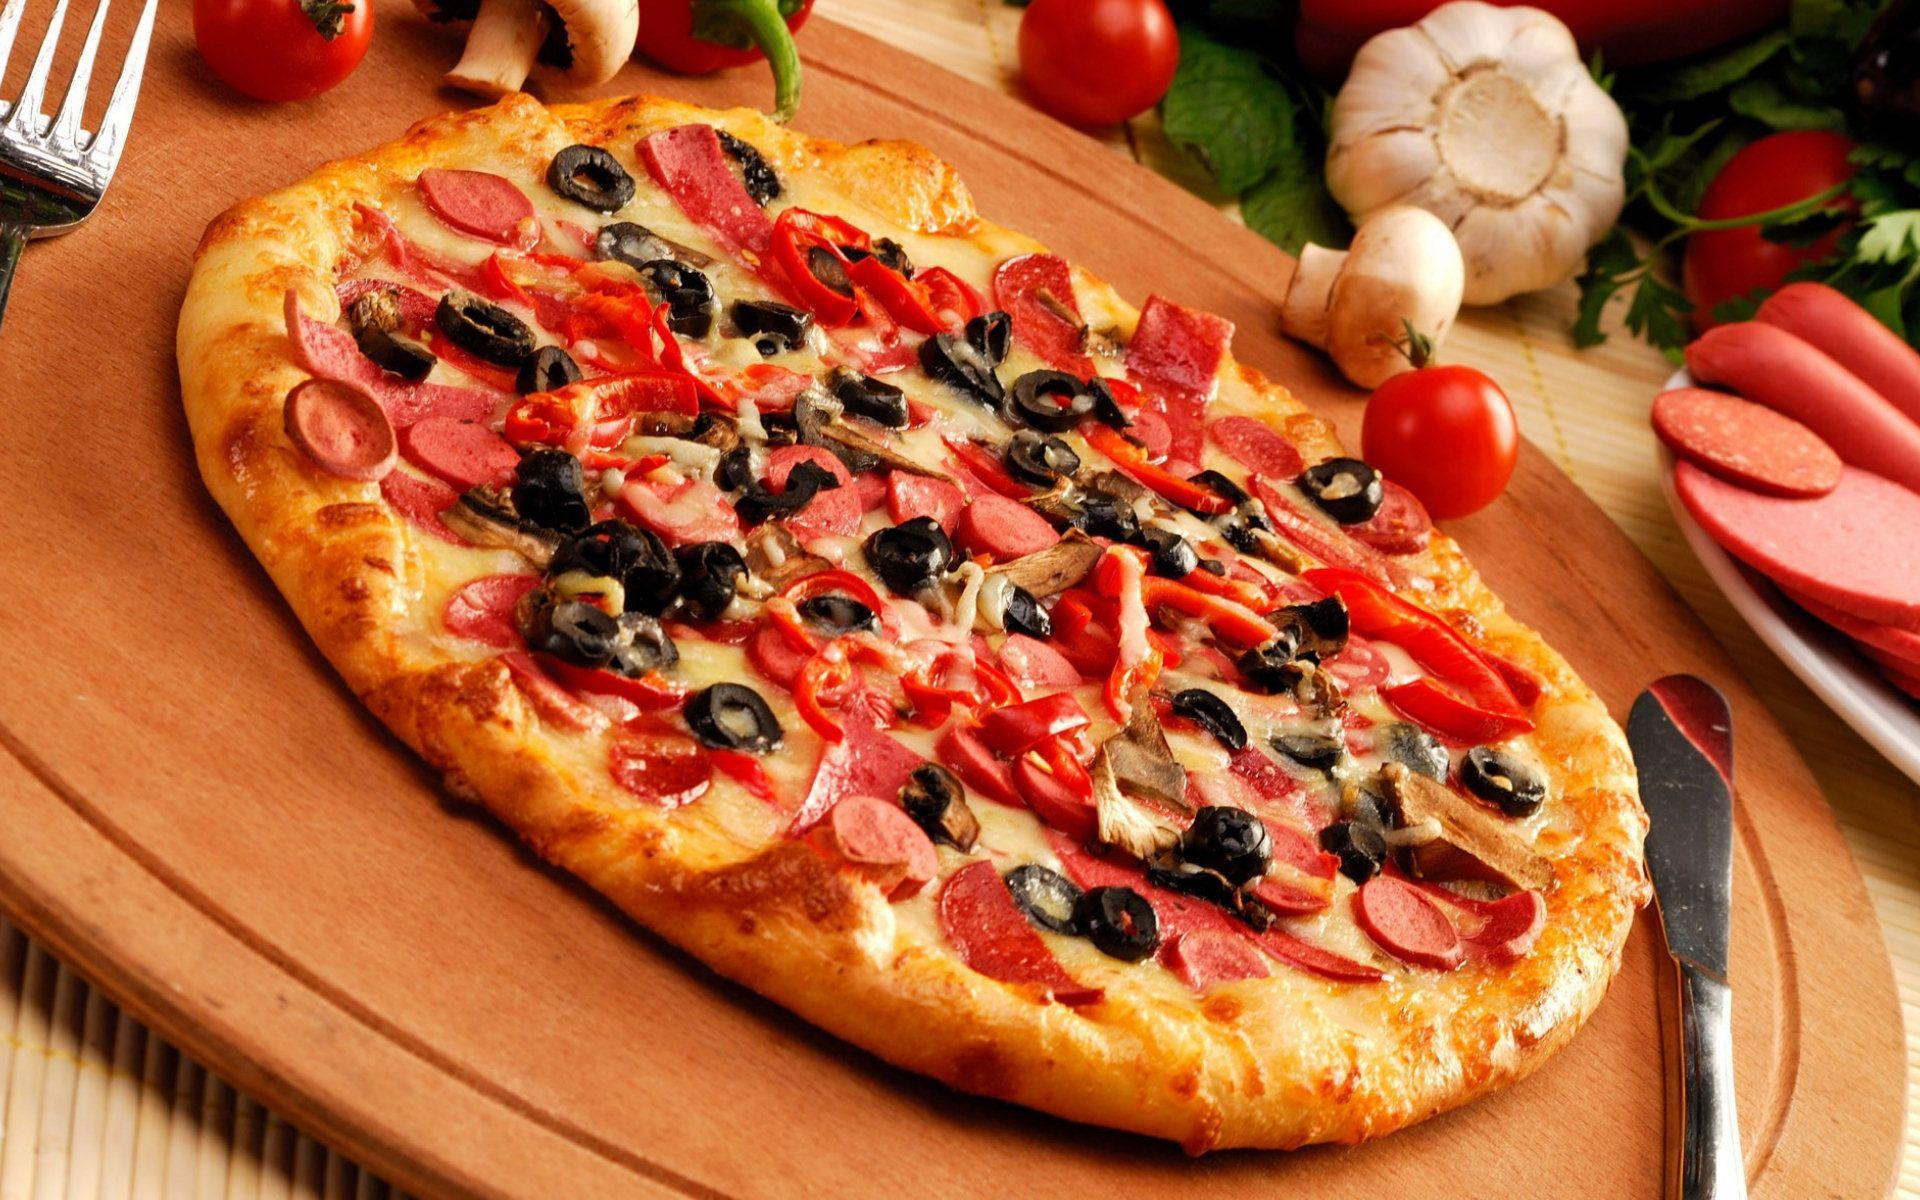 Pepperoni Pizza Wallpaper High Definition Delicious